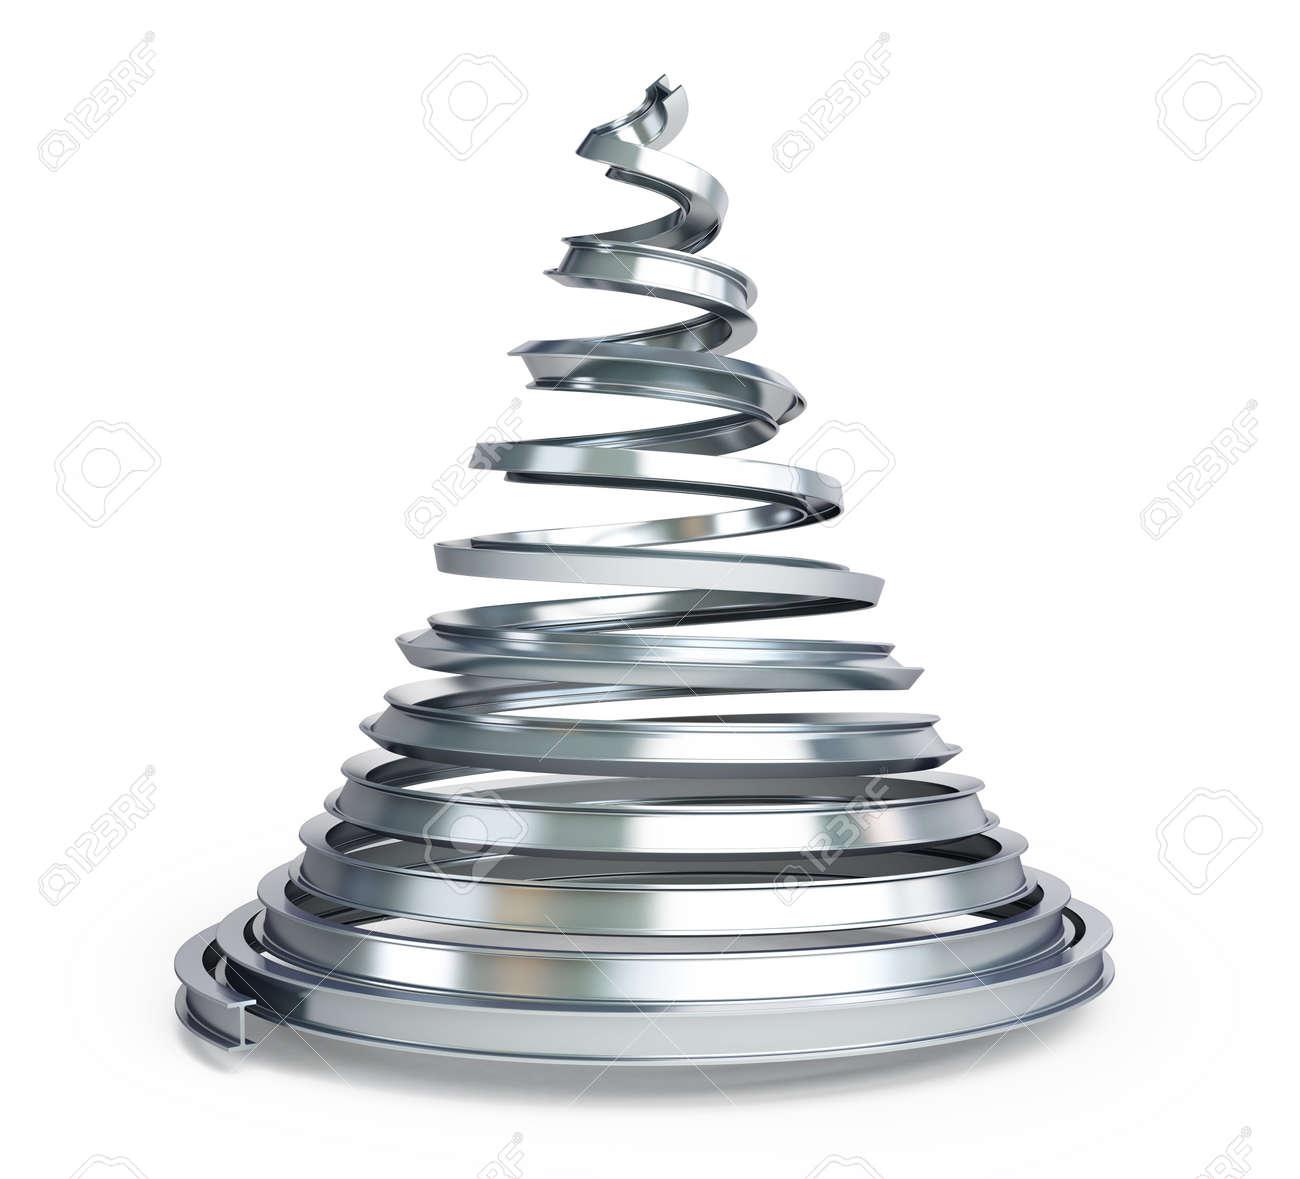 Weihnachtsbaum Metall.Stock Photo